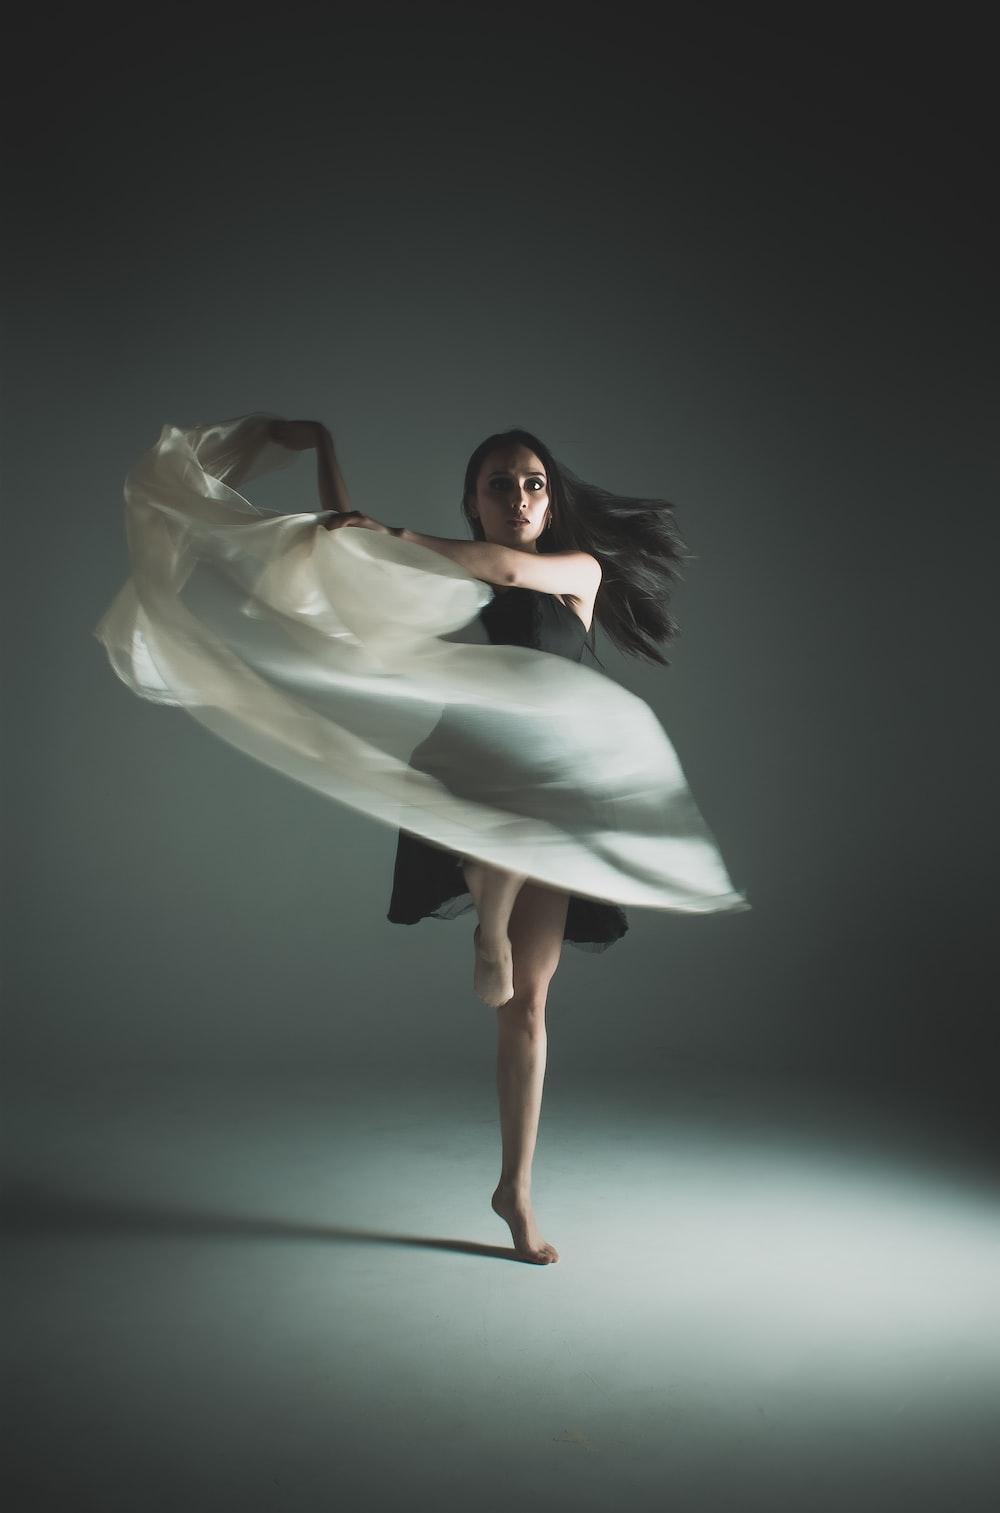 woman wearing black dress